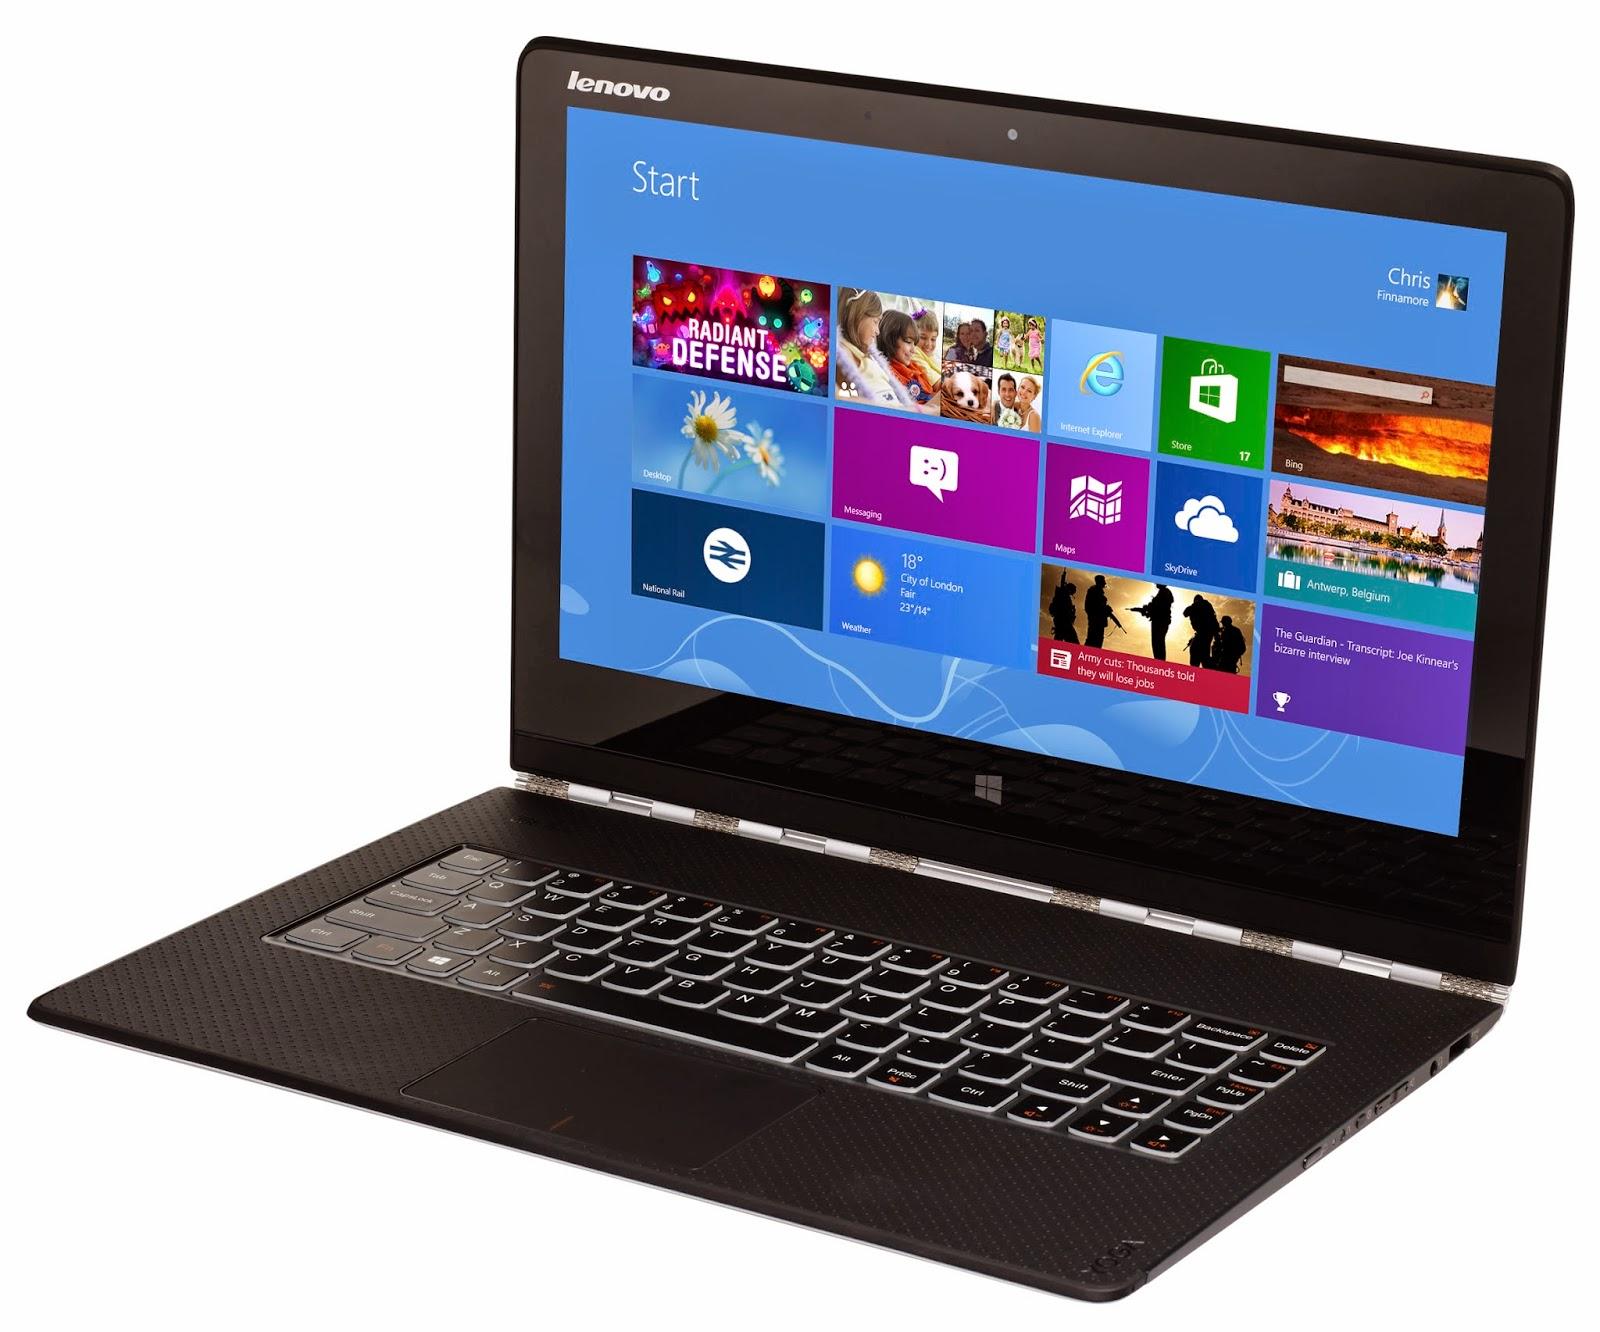 Laptop Paling Ringan di Dunia, Lenovo Yoga 3 Pro